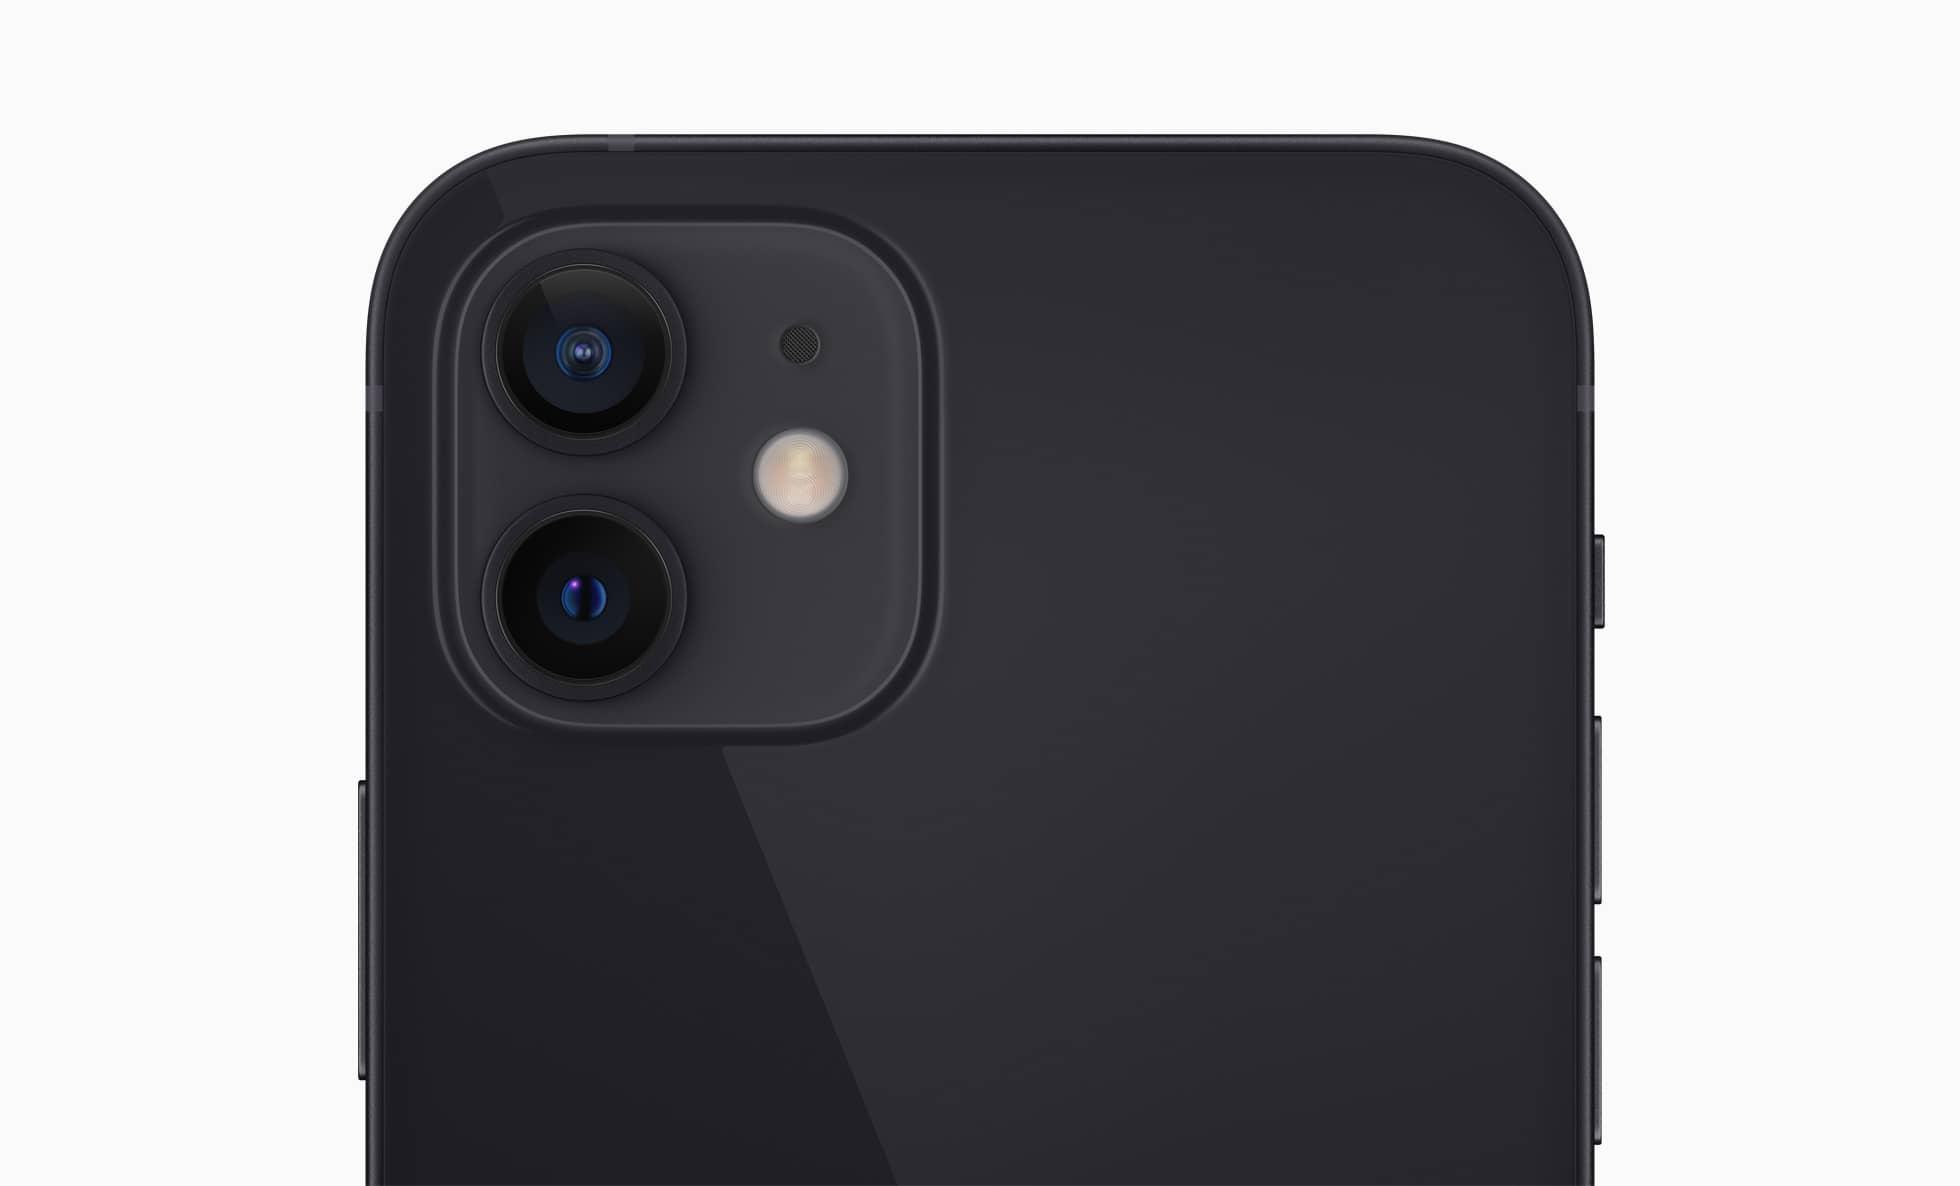 apple iphone 12 dual camera 10132020